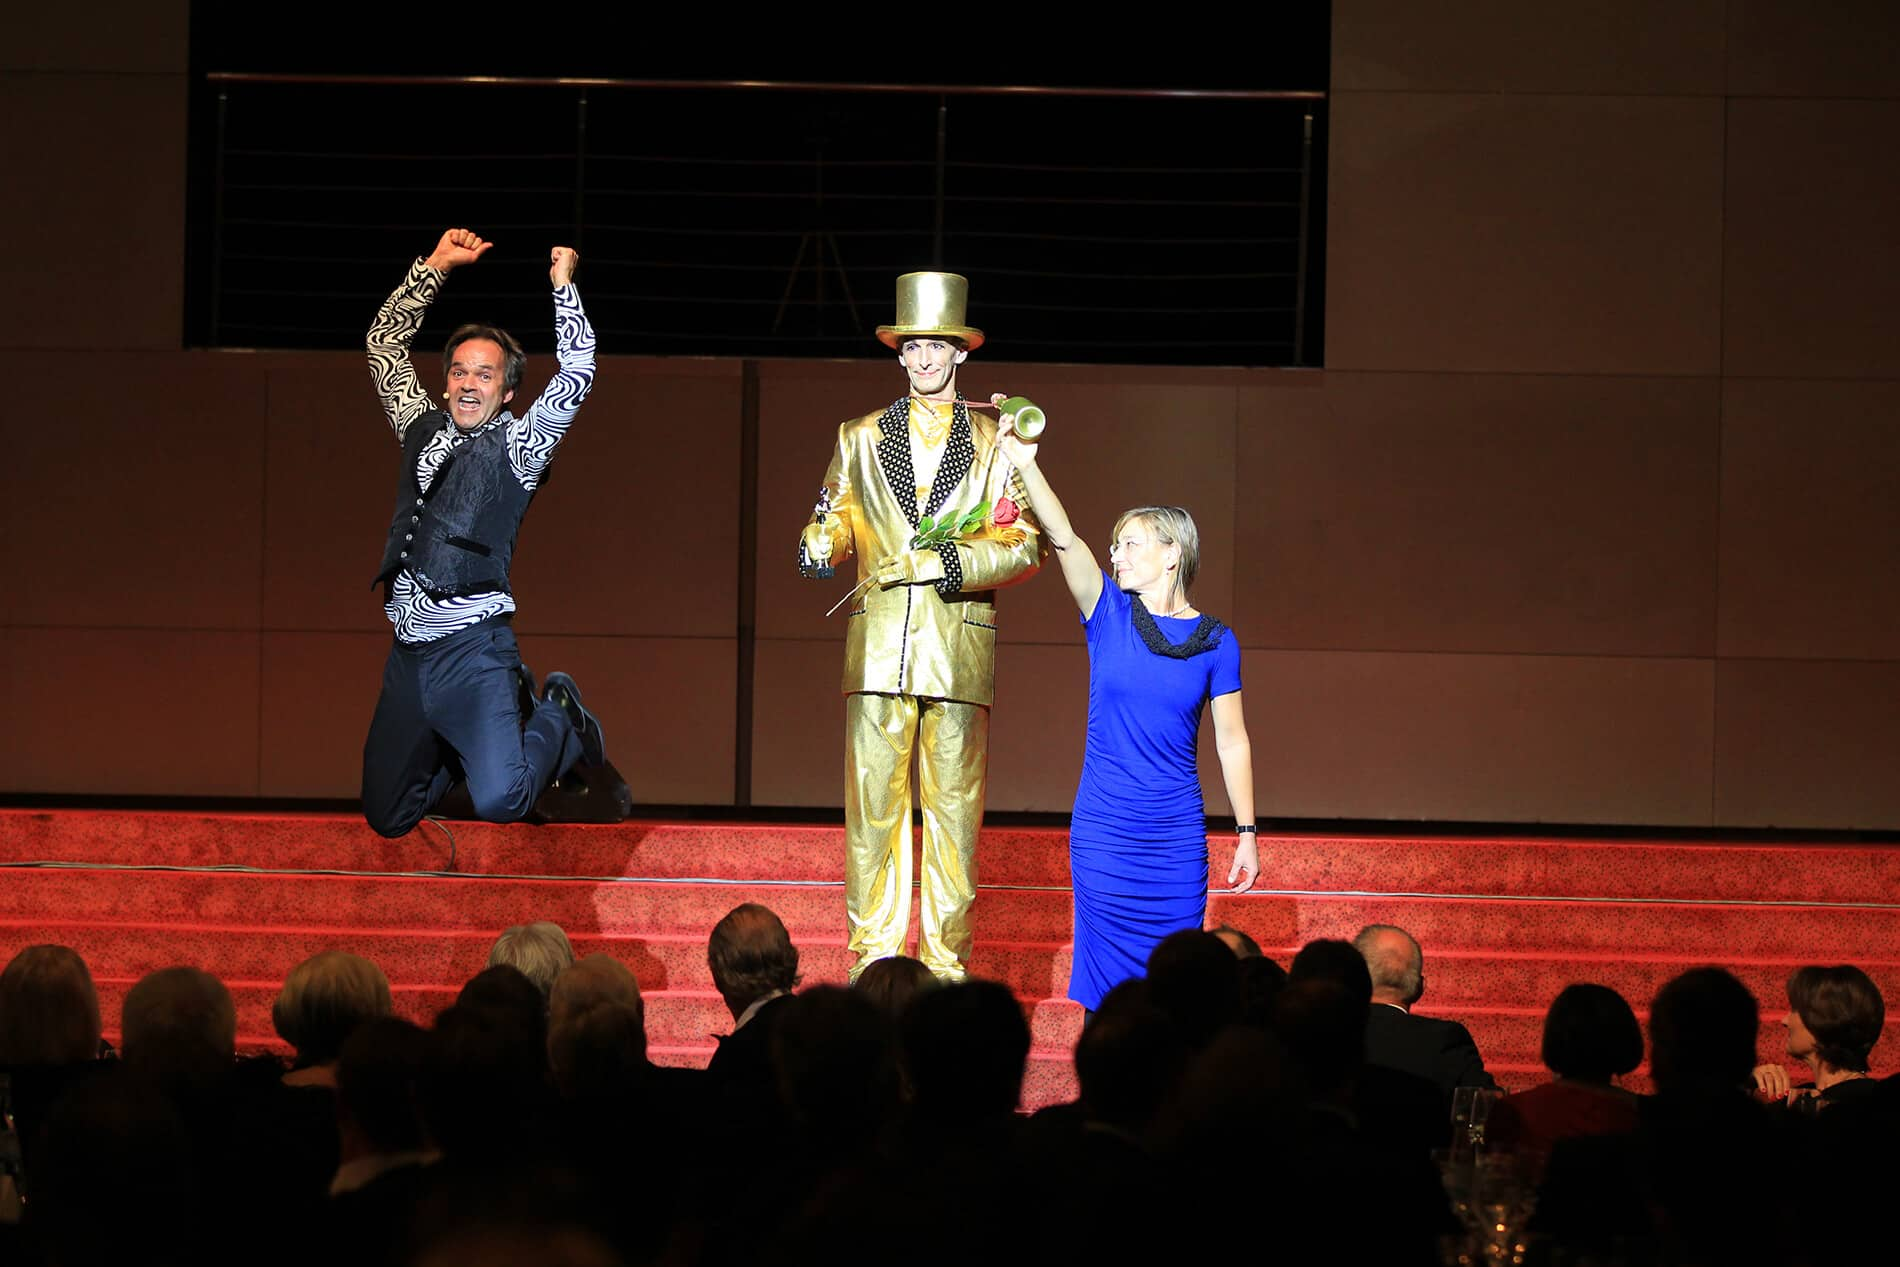 chapeau-bas-showact-artistik-und-comedy-9